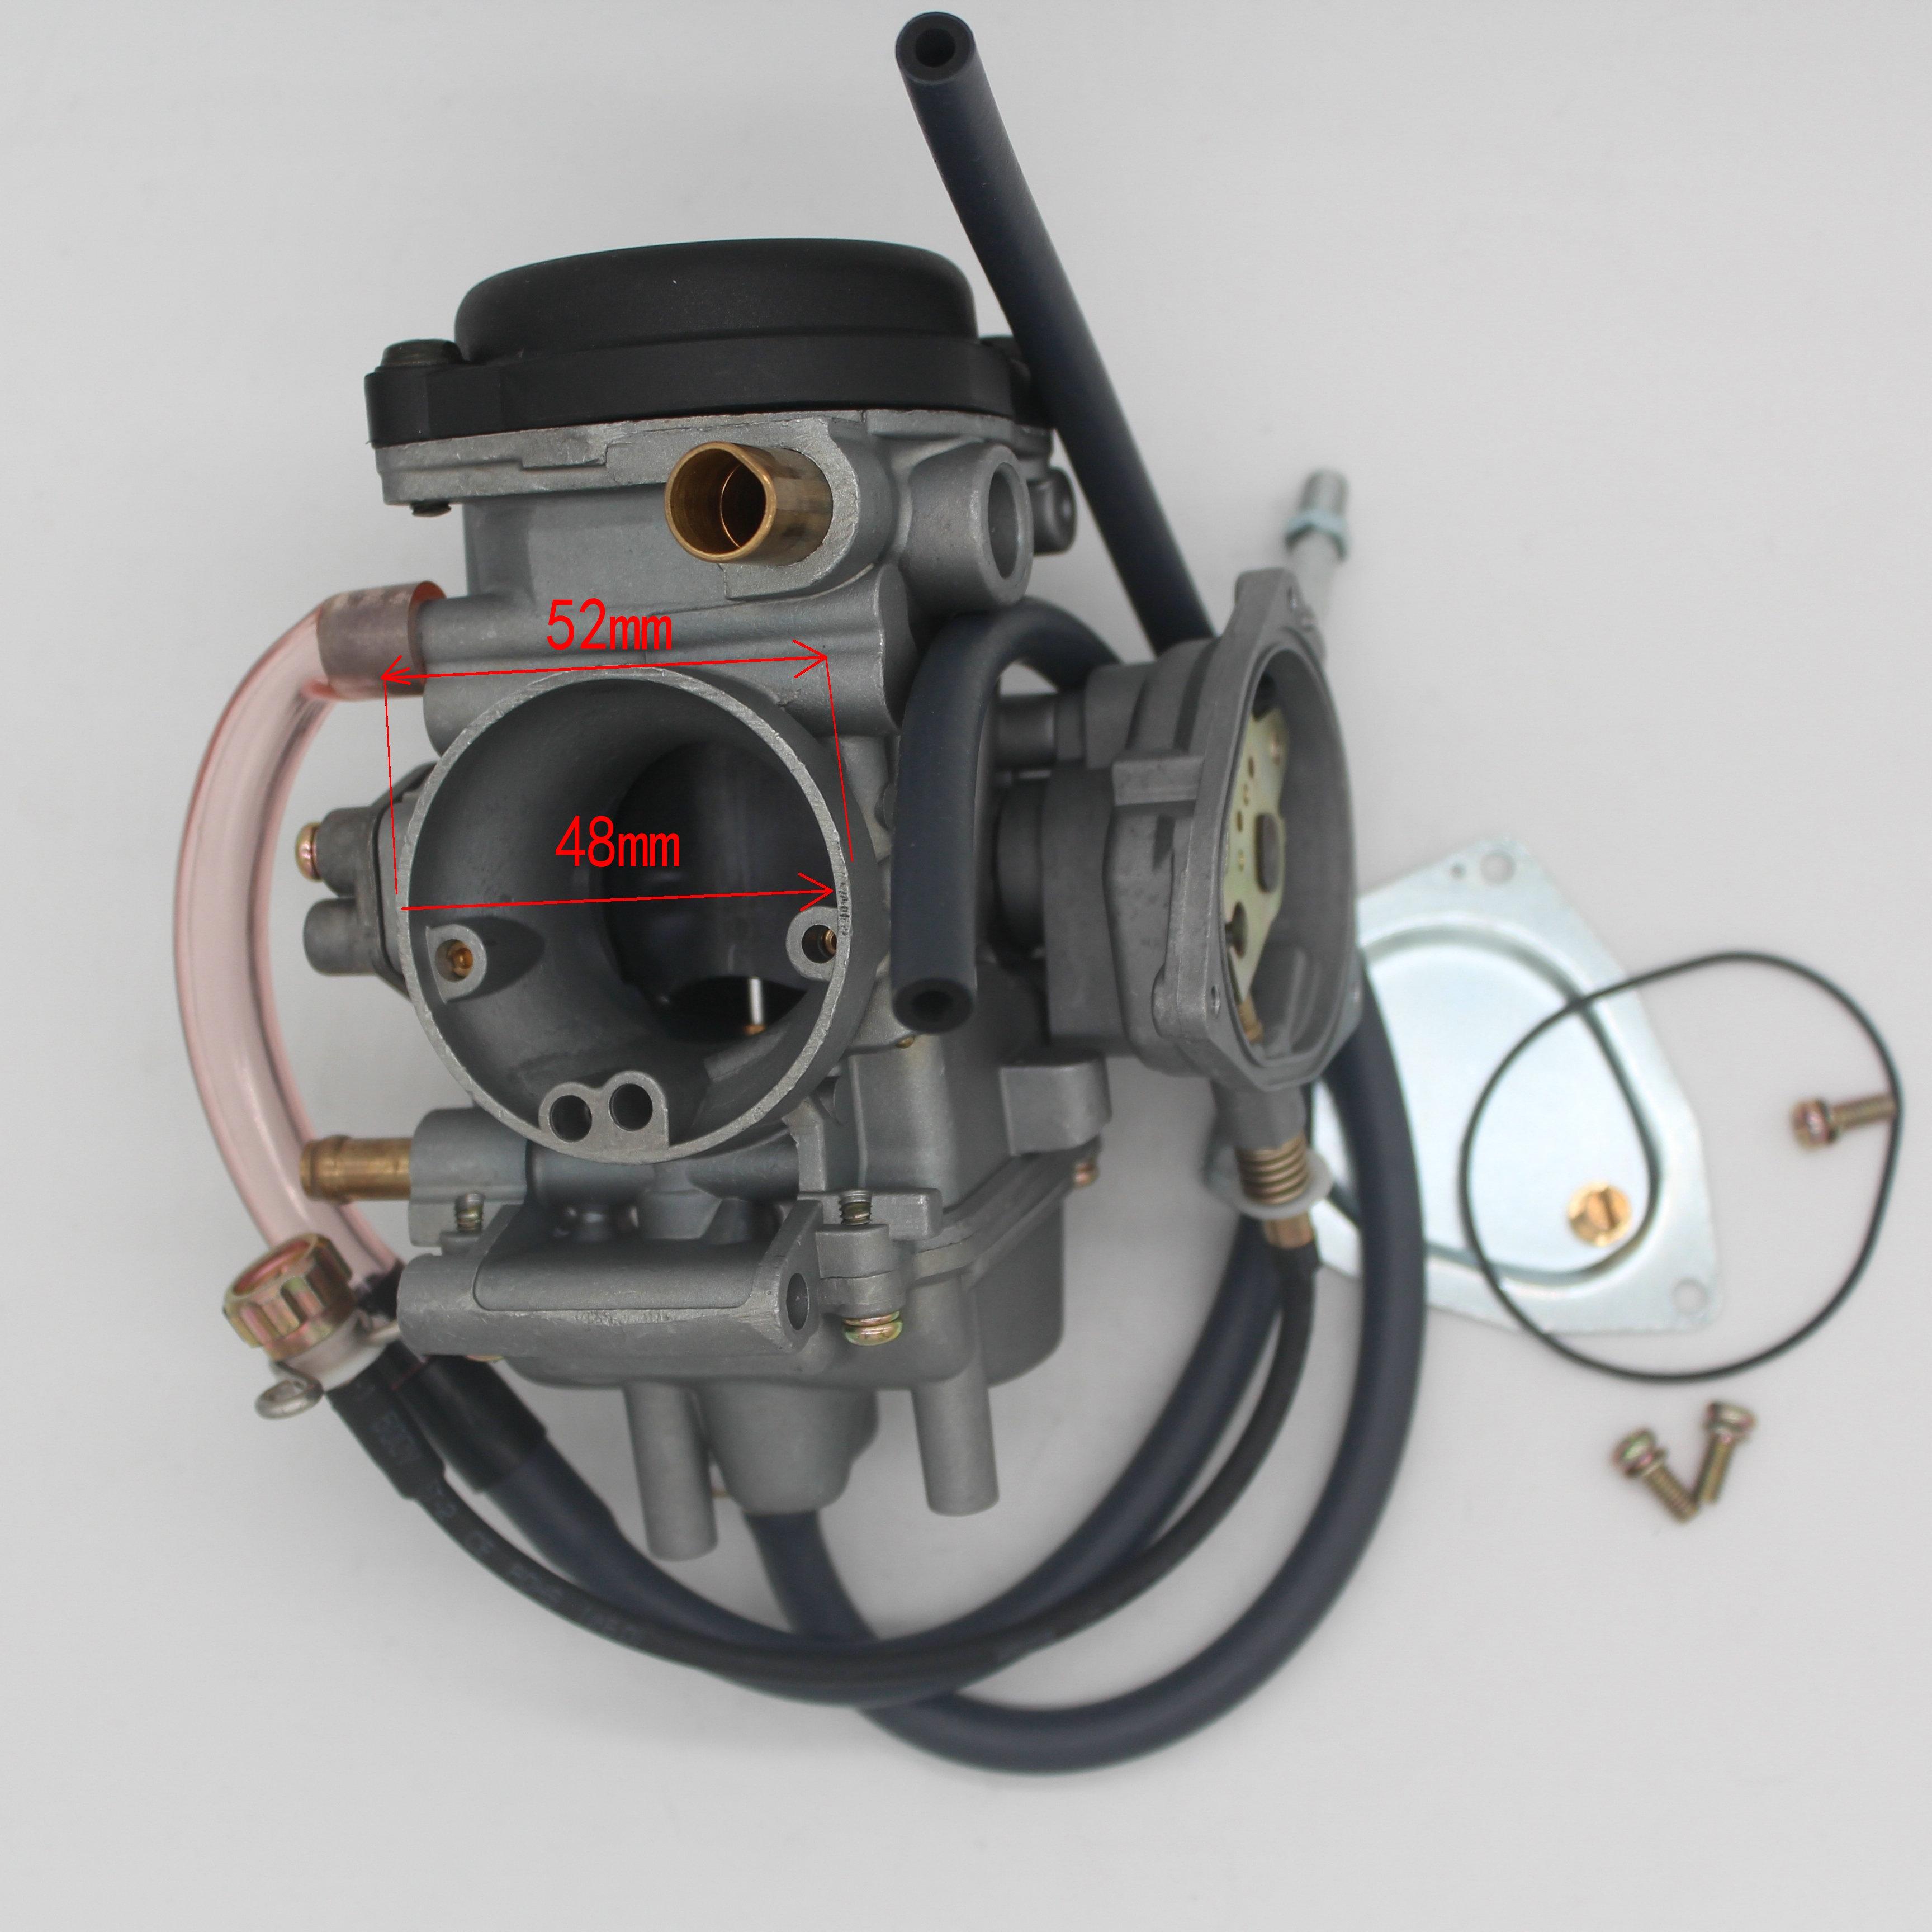 New Carburetor Rebuild Kit Yamaha YFM450 Kodiak 450cc 2003 2004 2005 2006